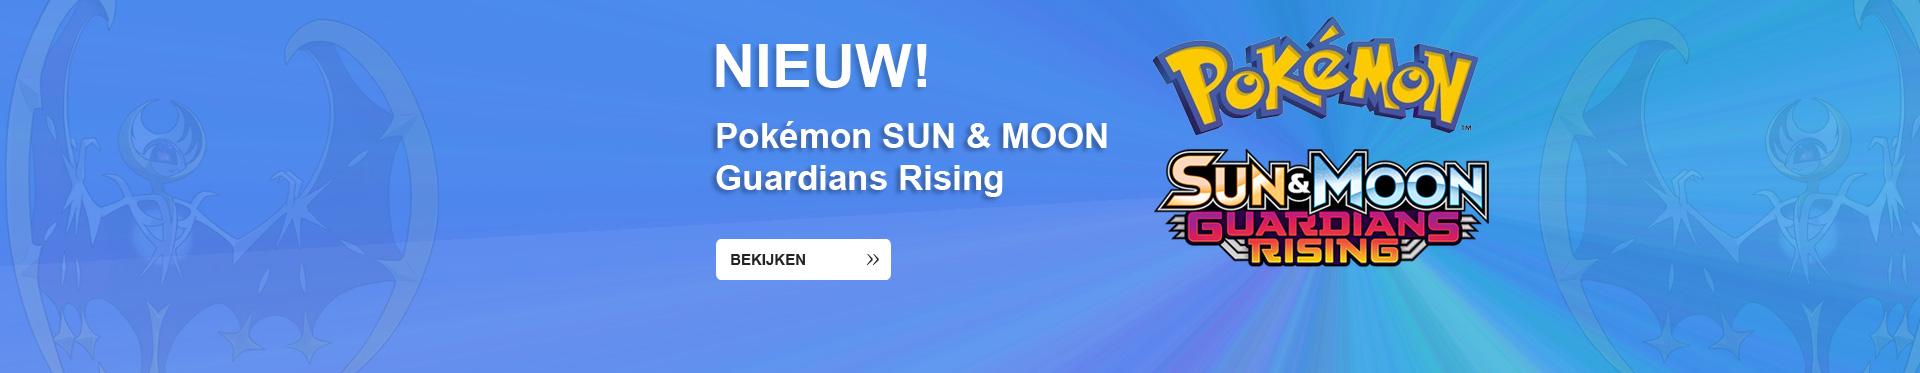 pokemon guardians rising